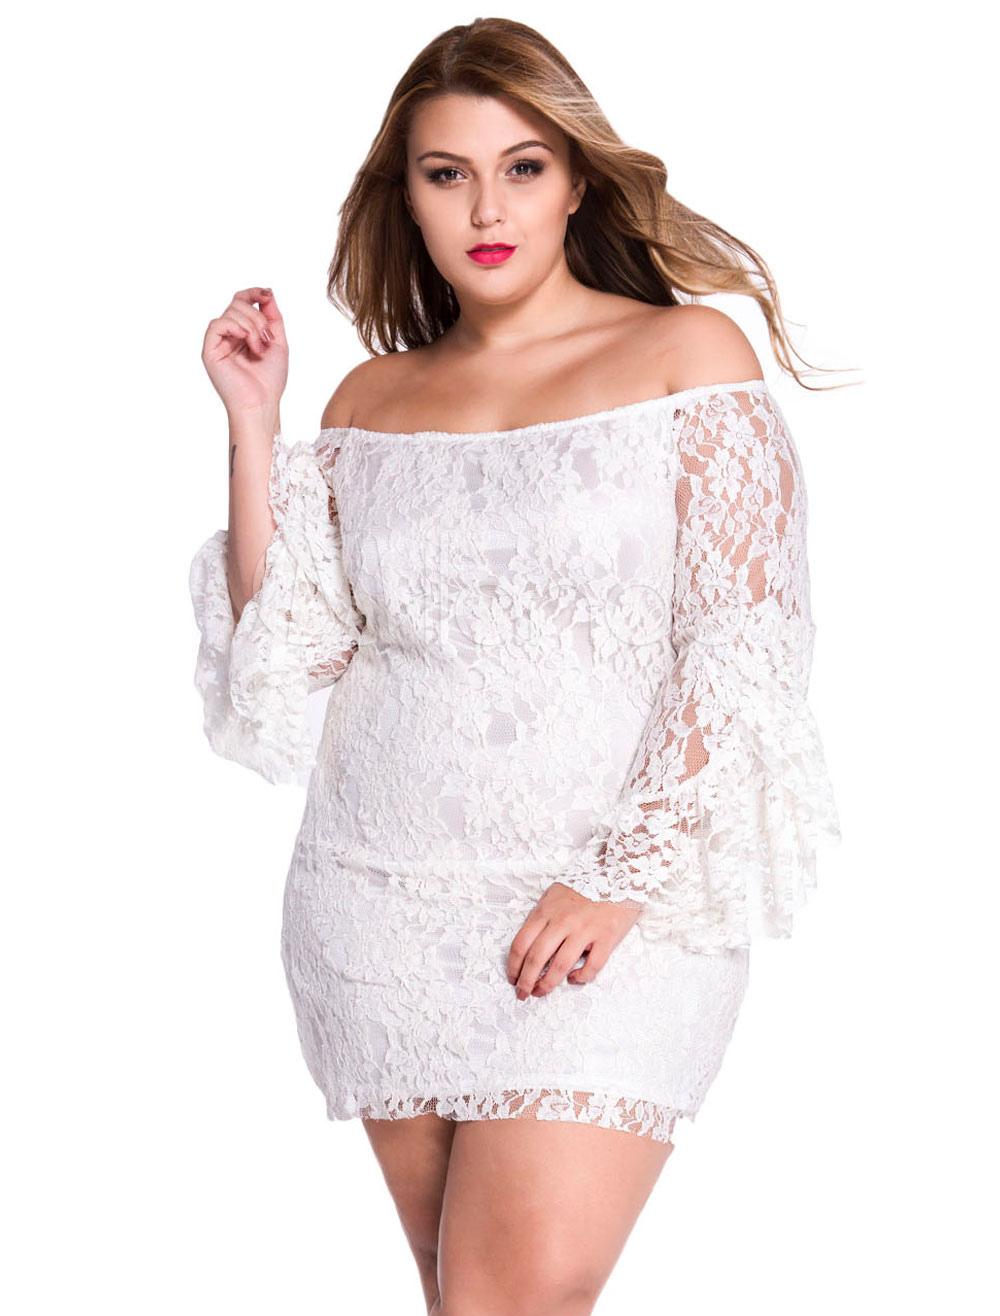 White Off-The-Shoulder Mini Dress Polyester Bodycon Dress